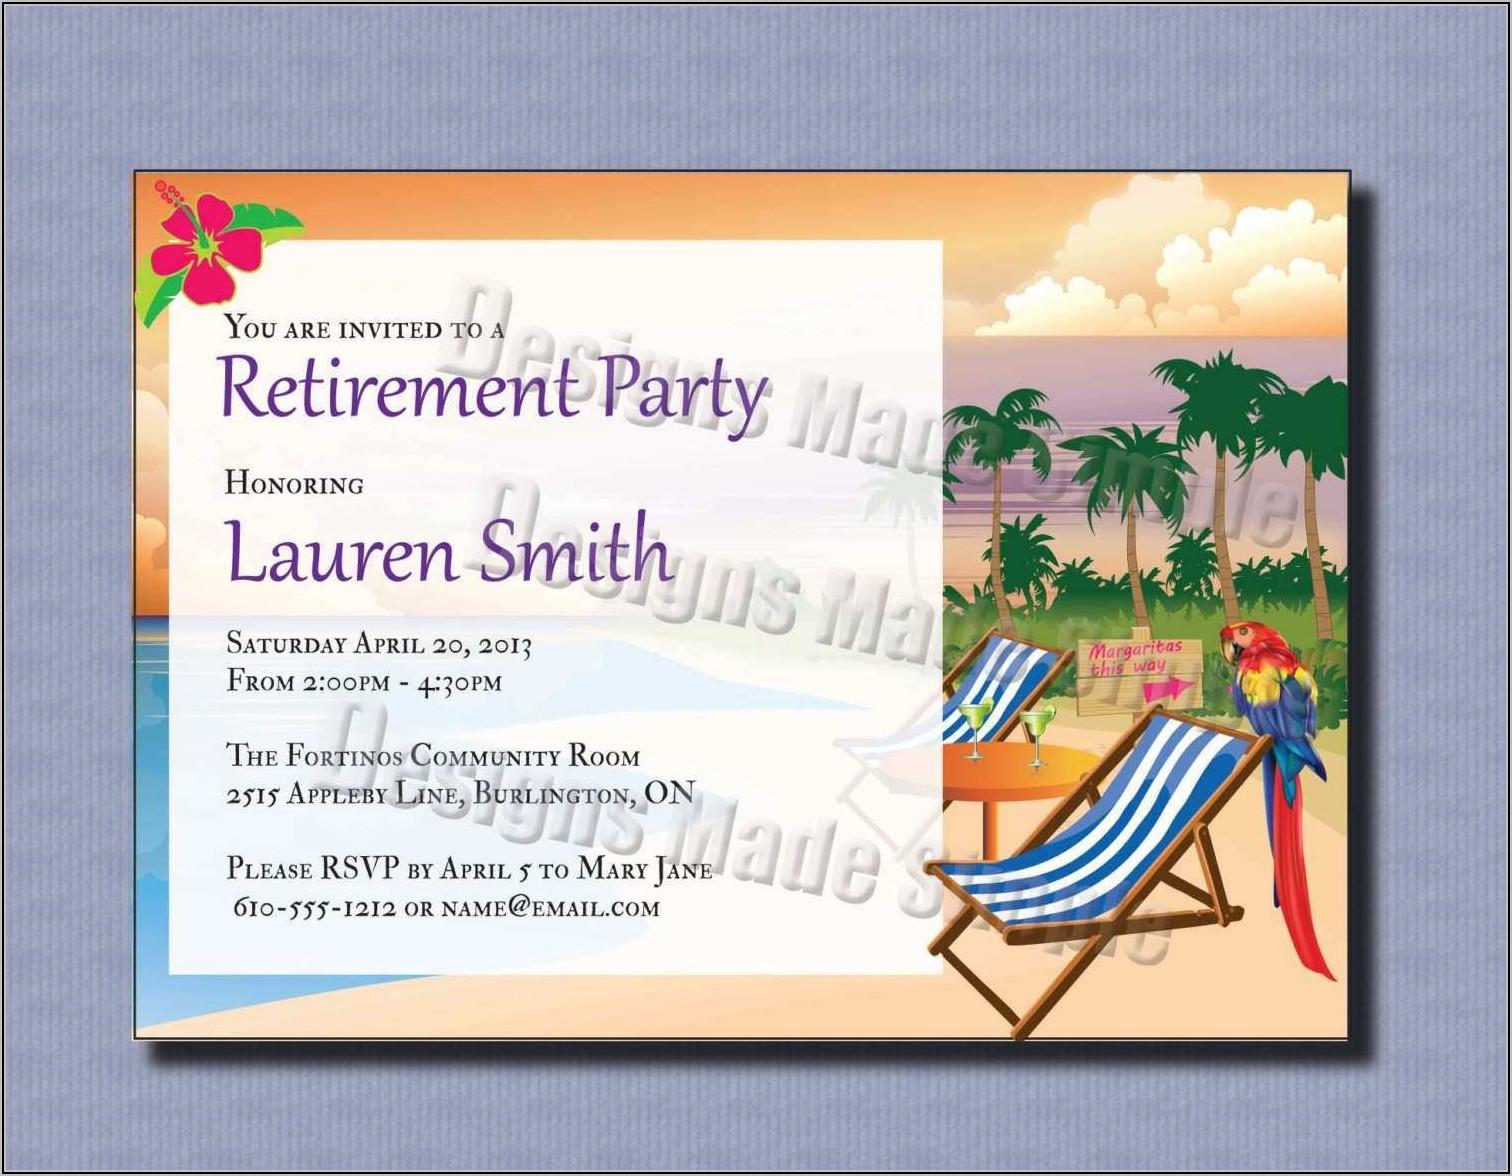 Retirement Party Invitation Photoshop Template